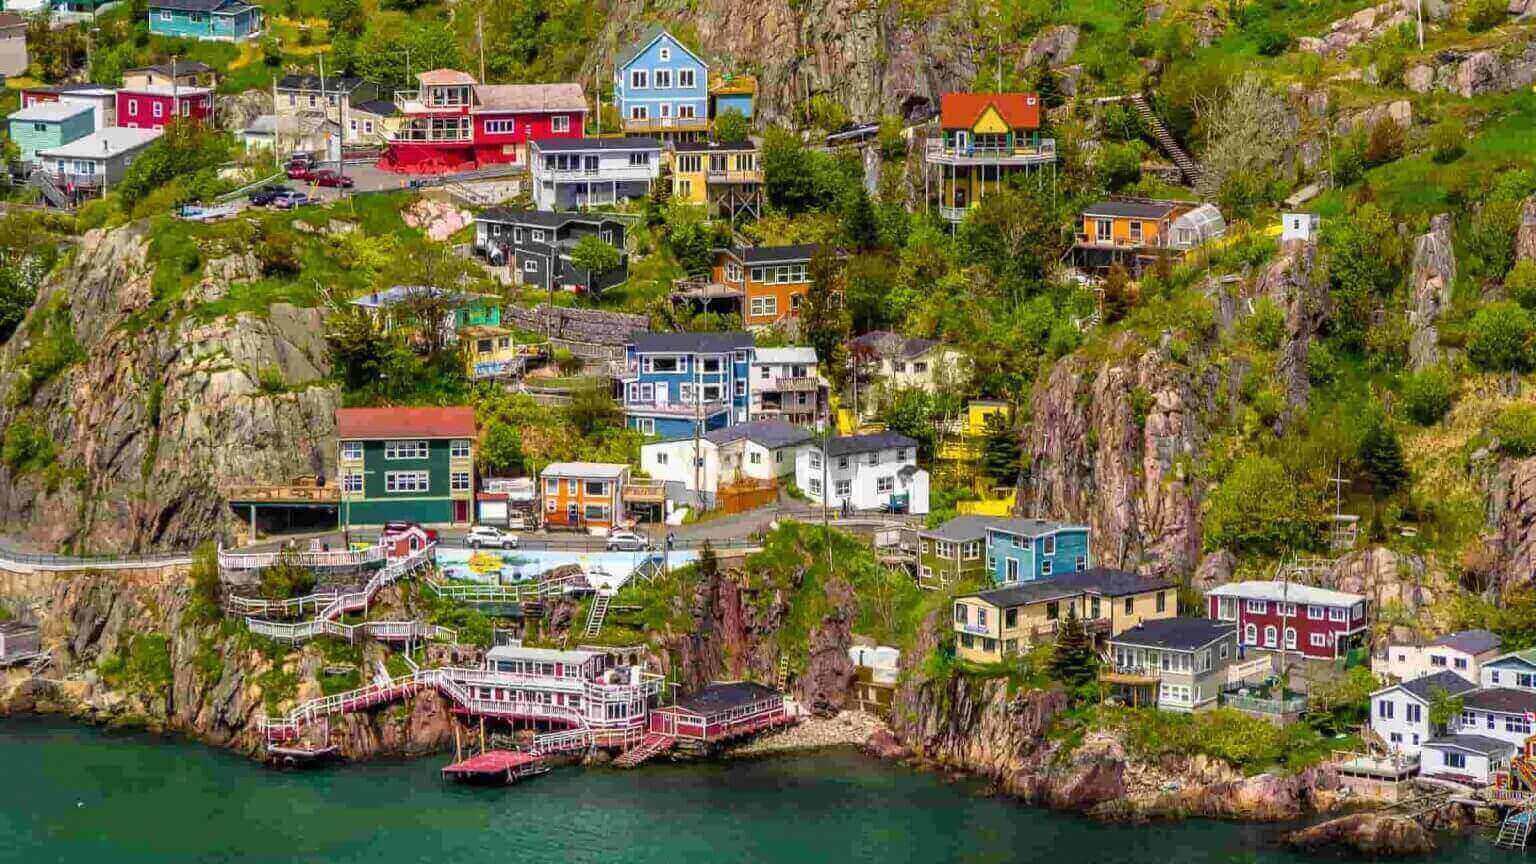 St Johns, Canada